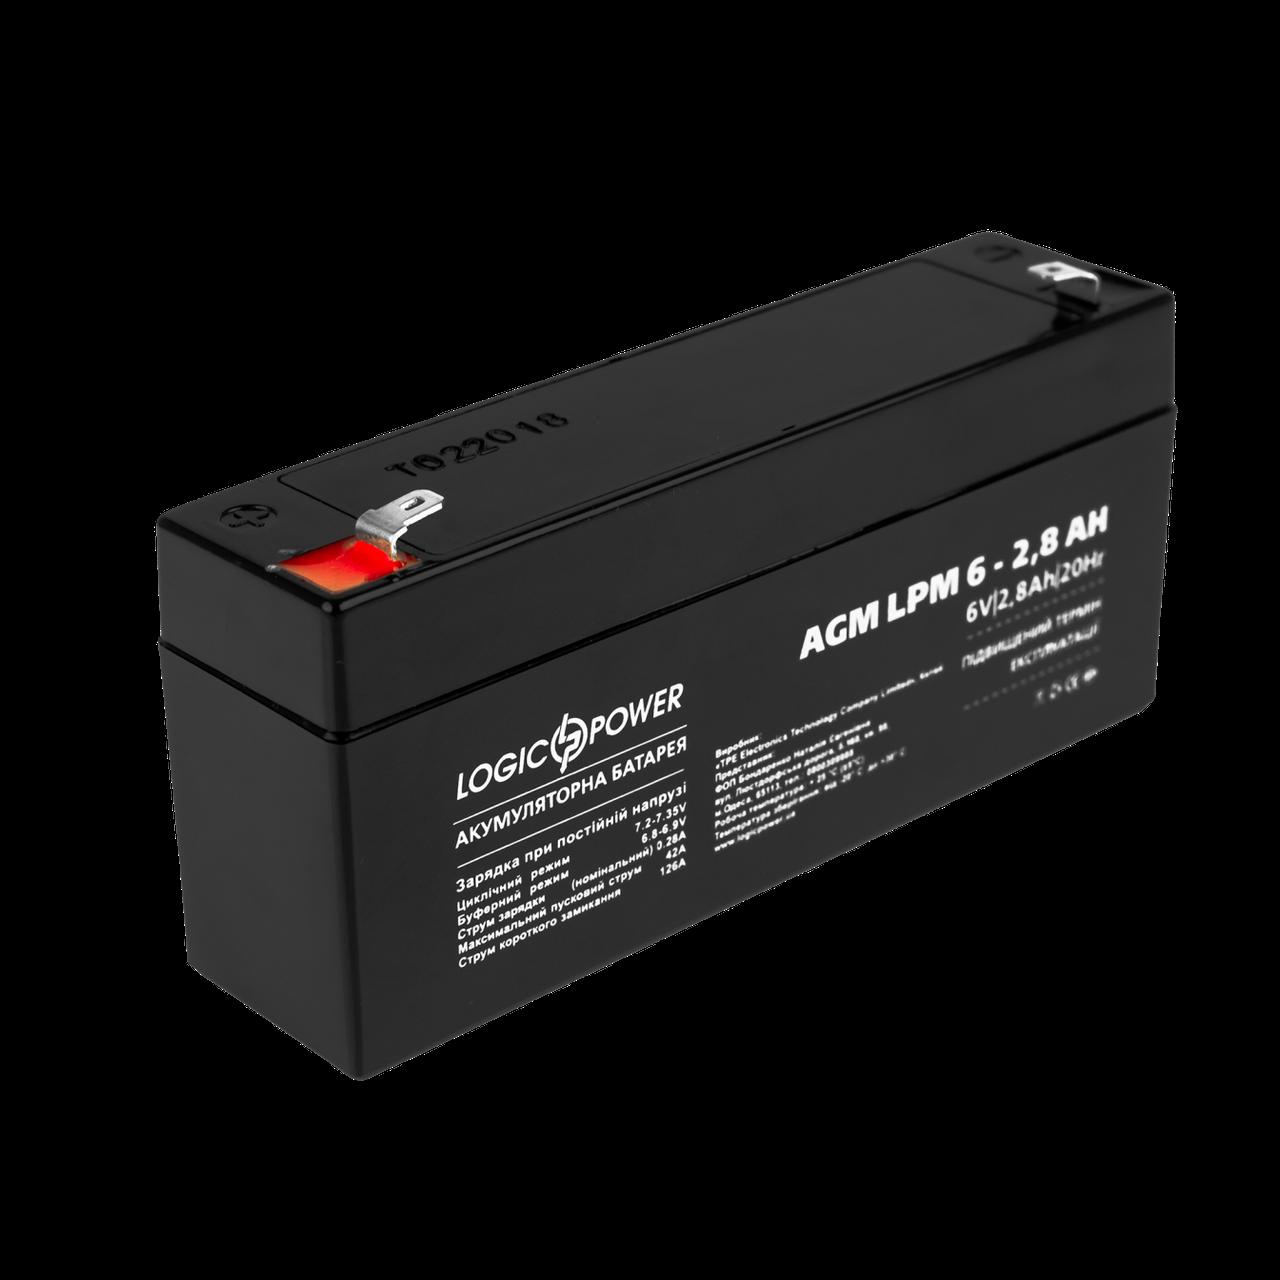 Аккумулятор AGM LogicPower LPM 6-2.8 AH 0004622 LP4622